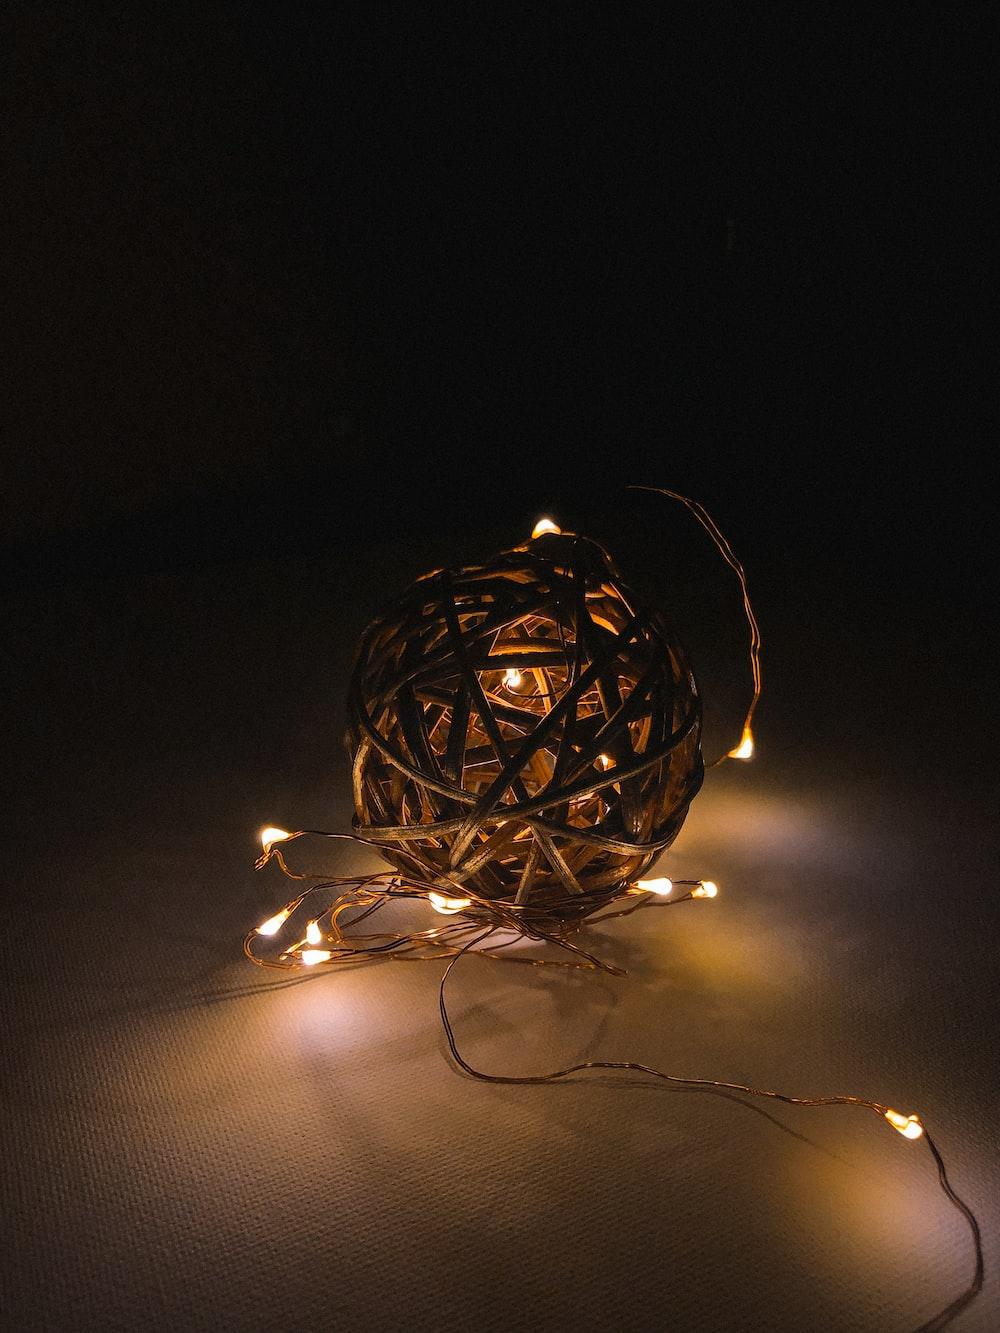 brown ball of light